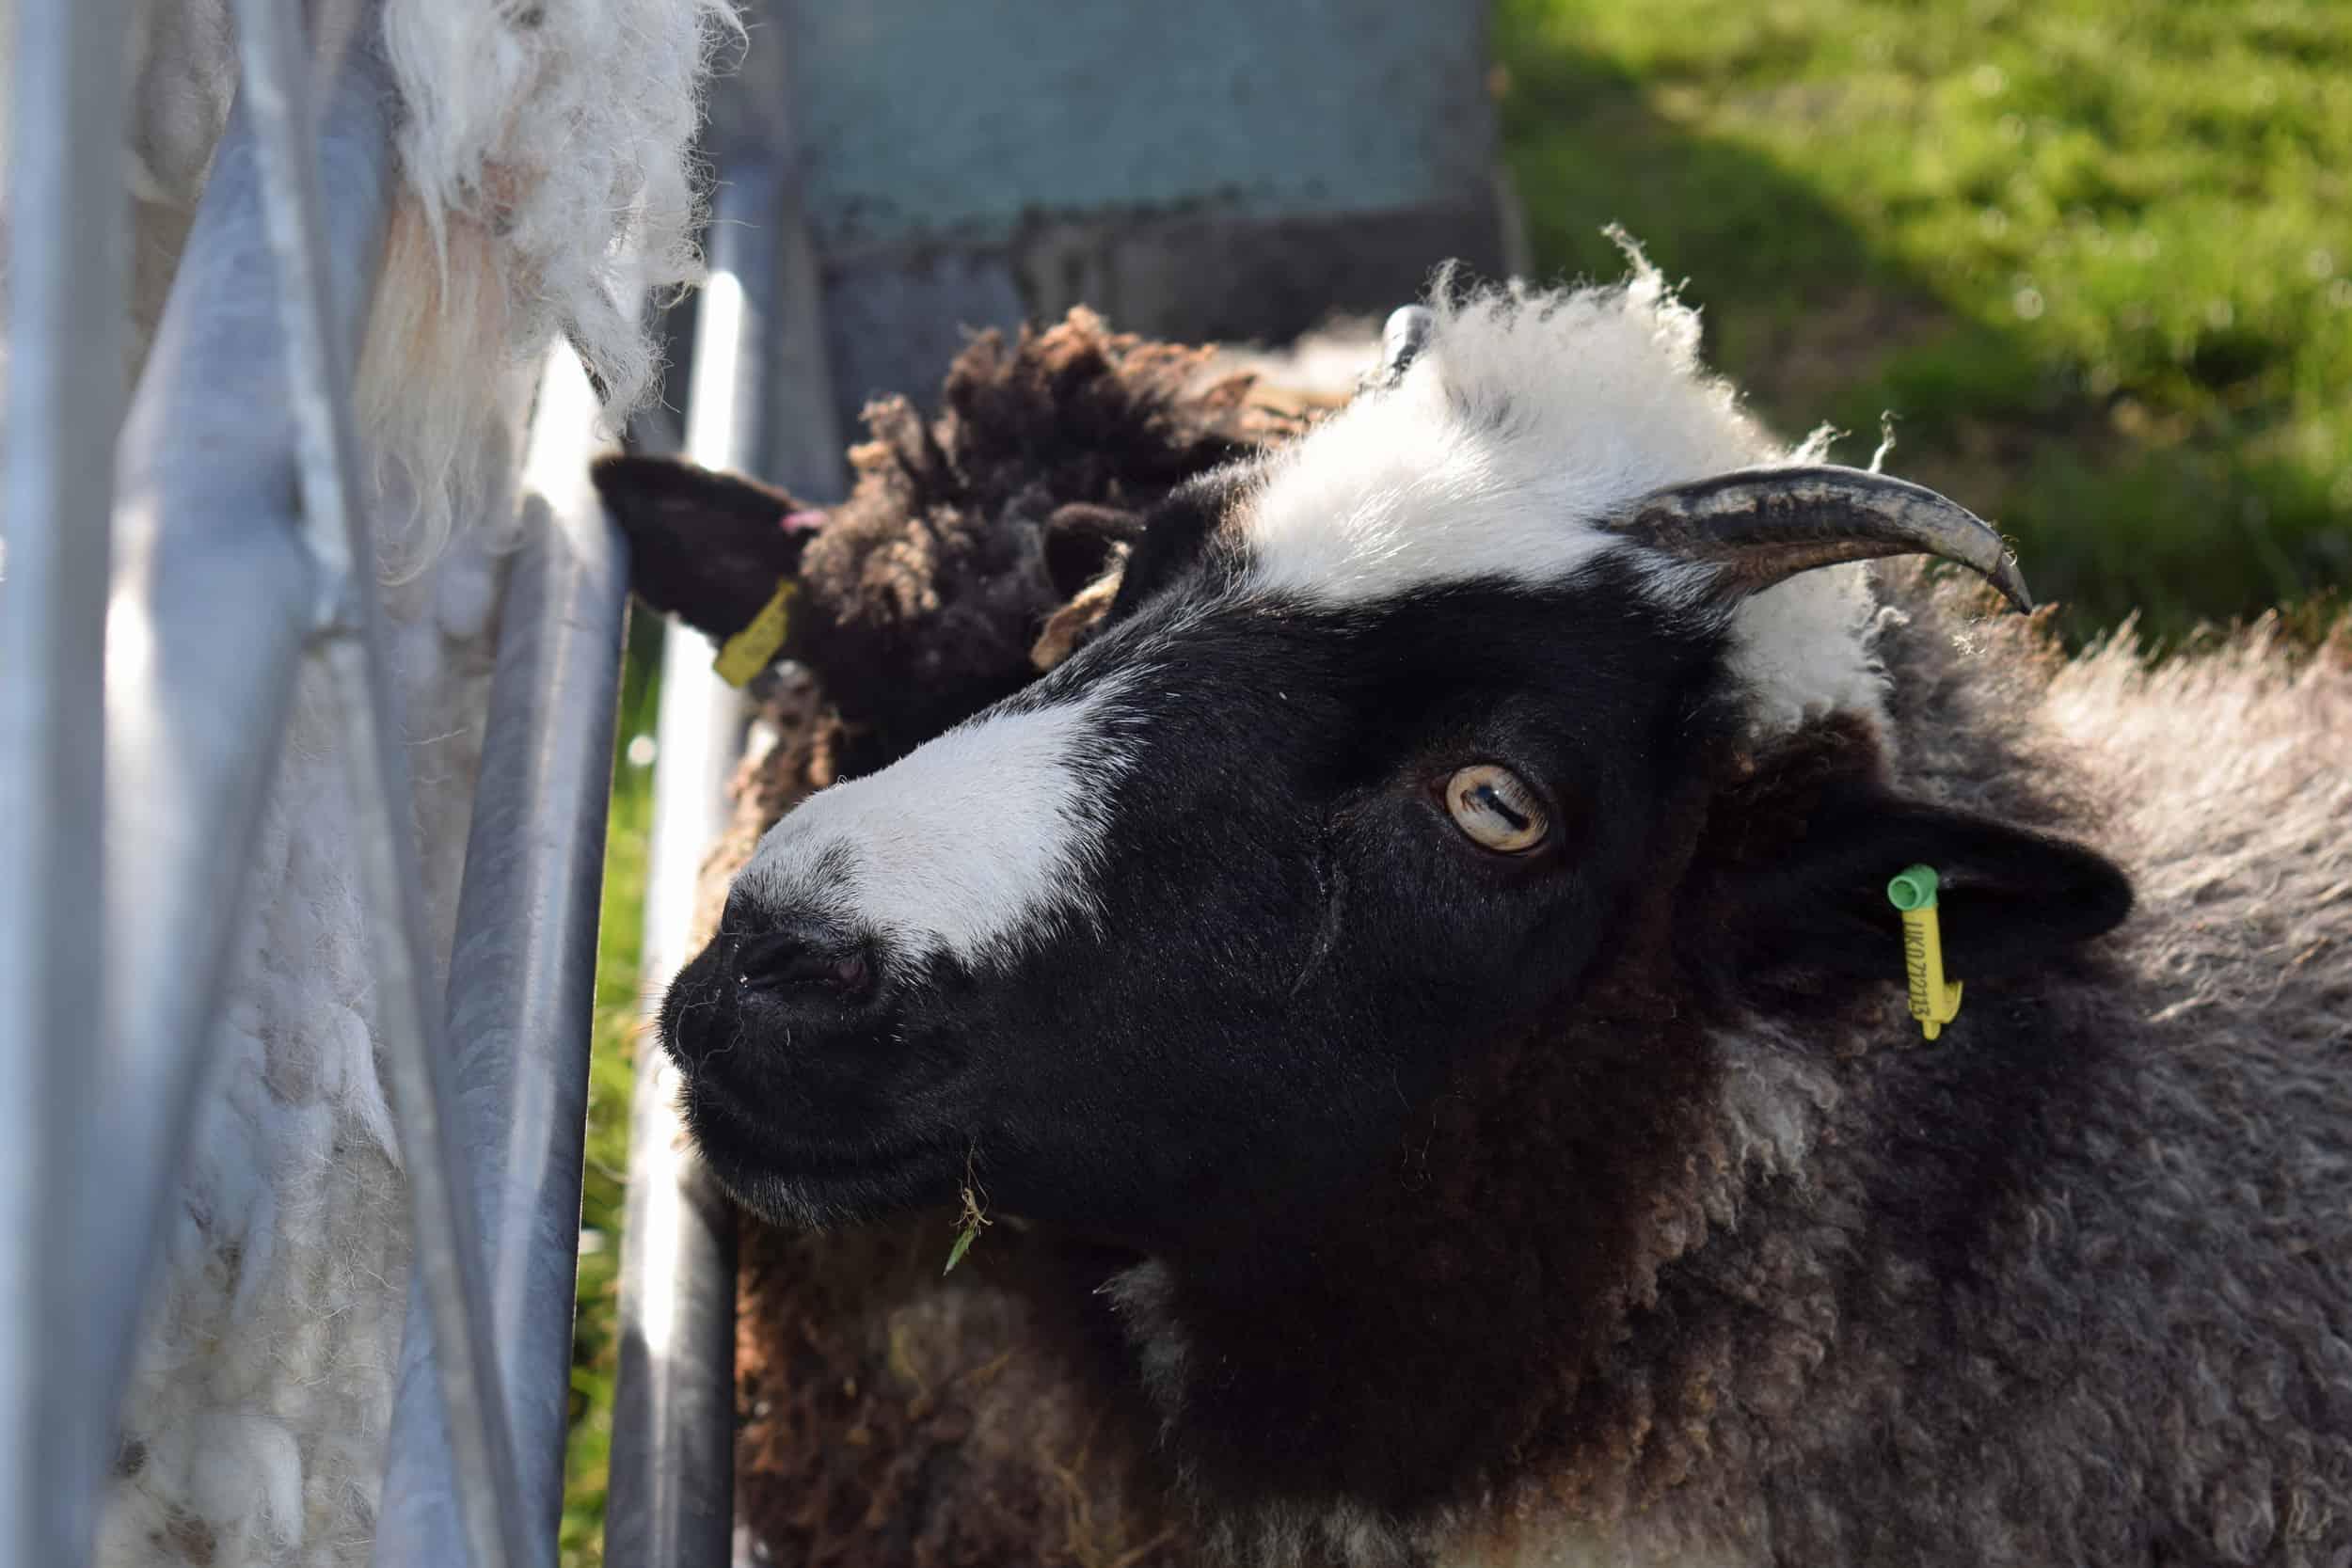 Holly pet lamb sheep jacob cross shetland spotted black grey white wales gwynedd british wool gifts homeware